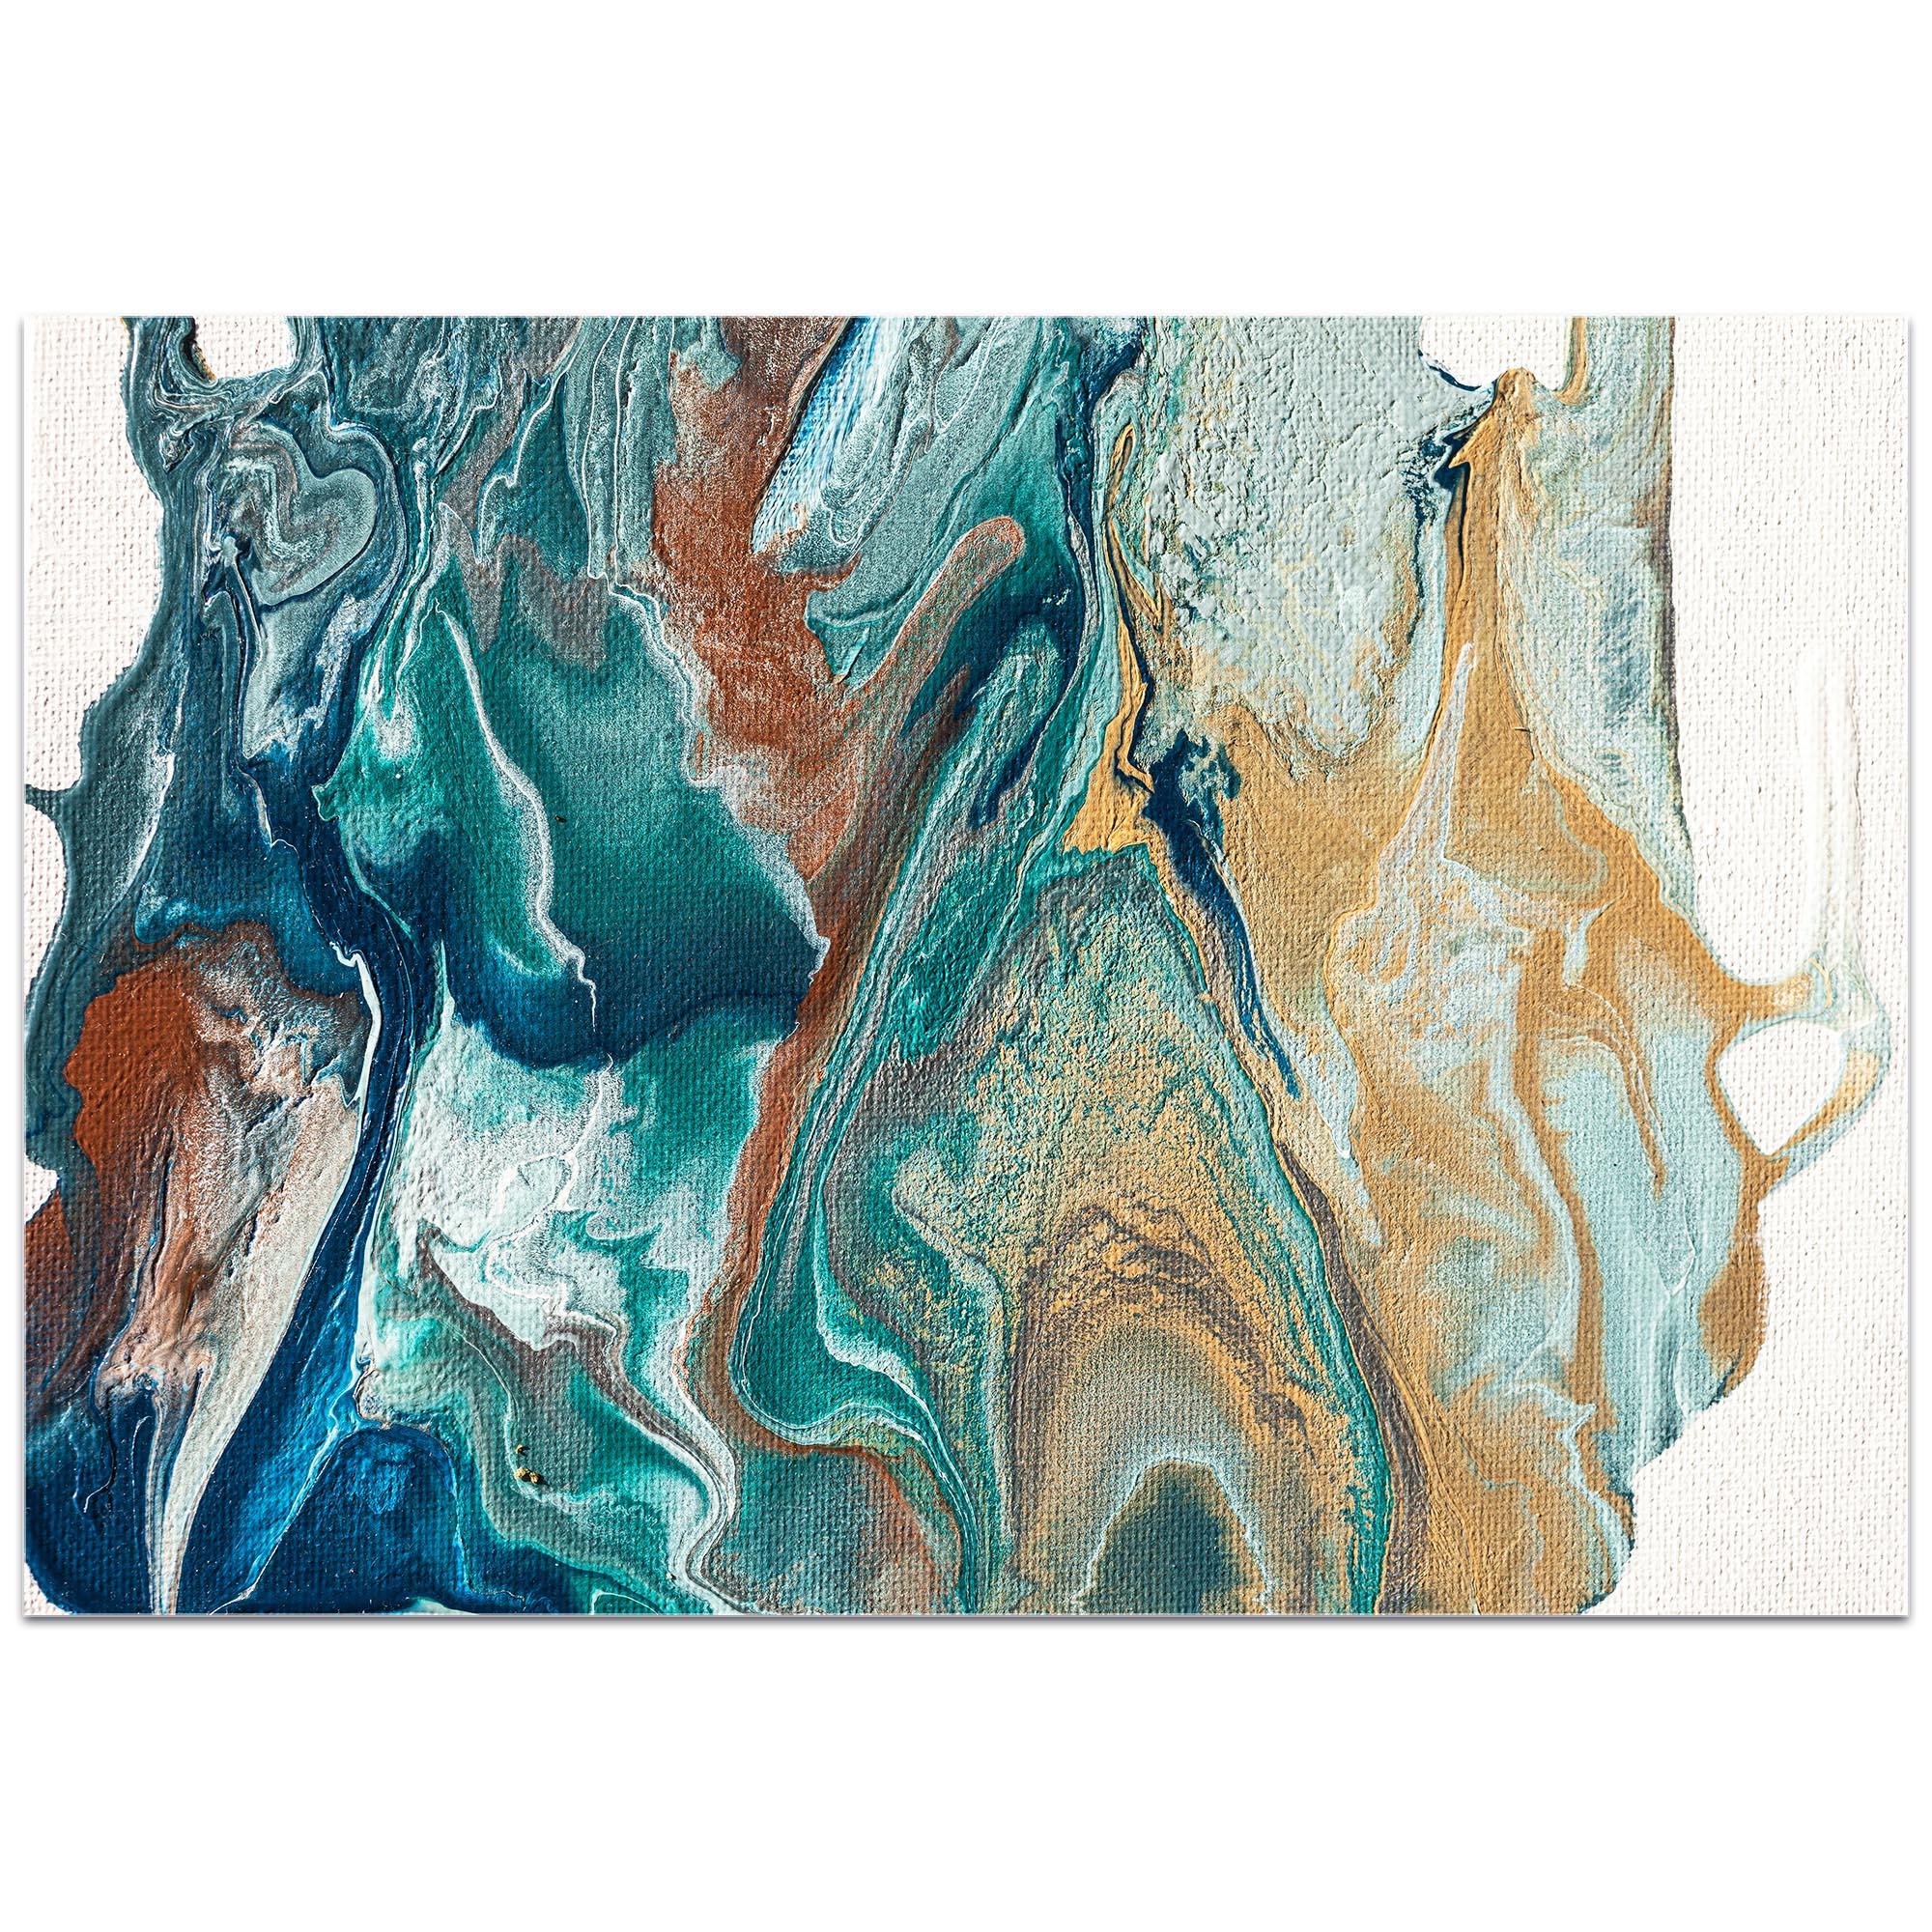 Abstract Wall Art 'Earth 2' - Urban Splatter Decor on Metal or Plexiglass - Image 2